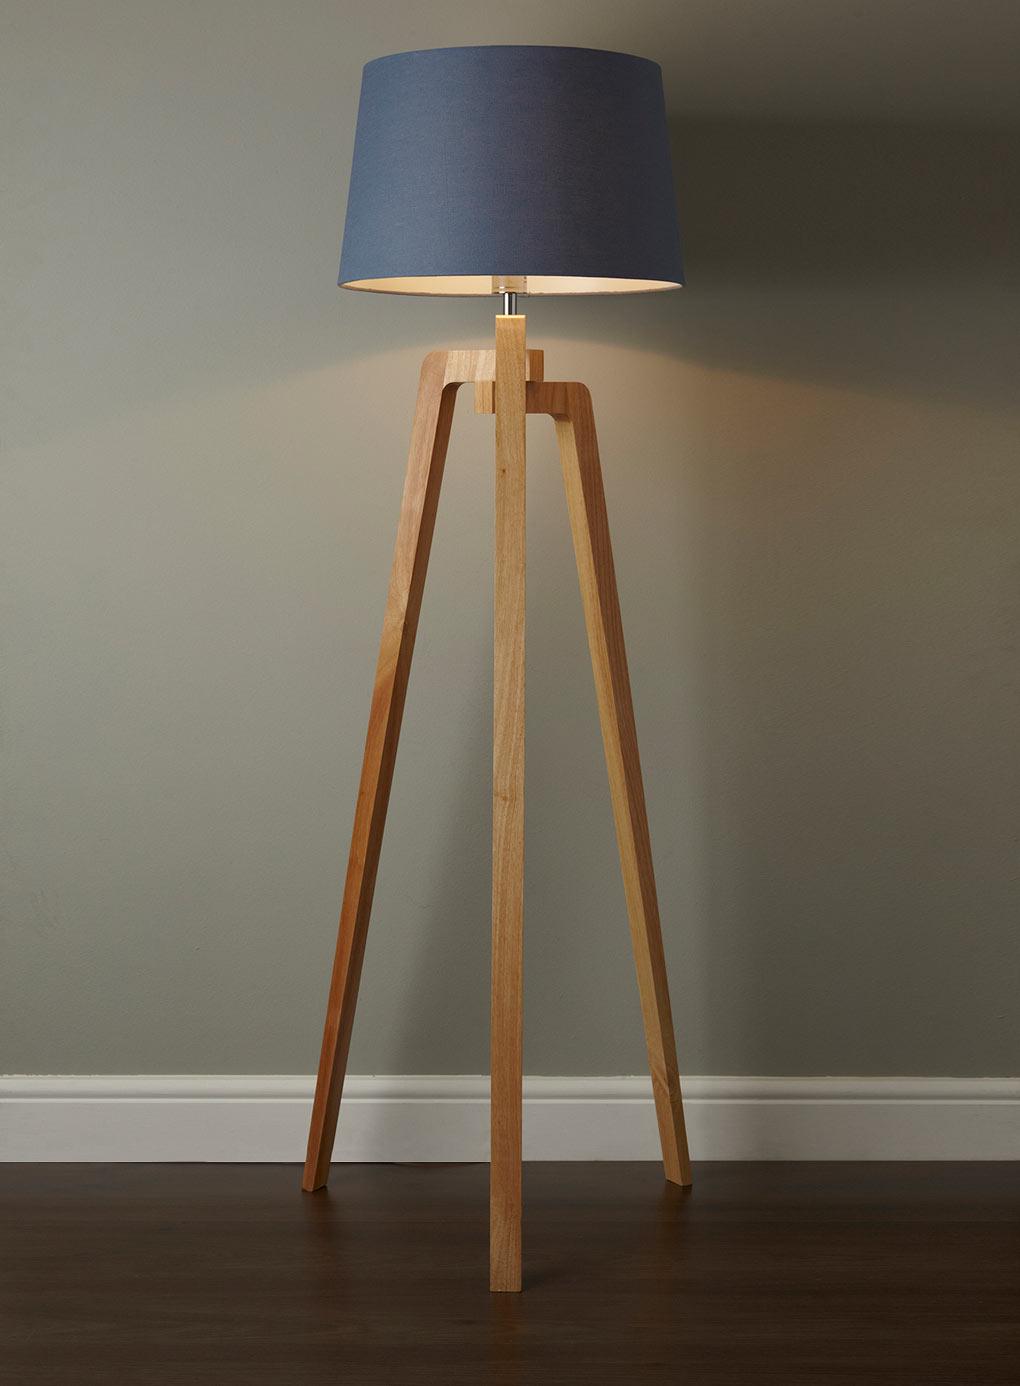 lamps apron lamp diy floor tripod savvy